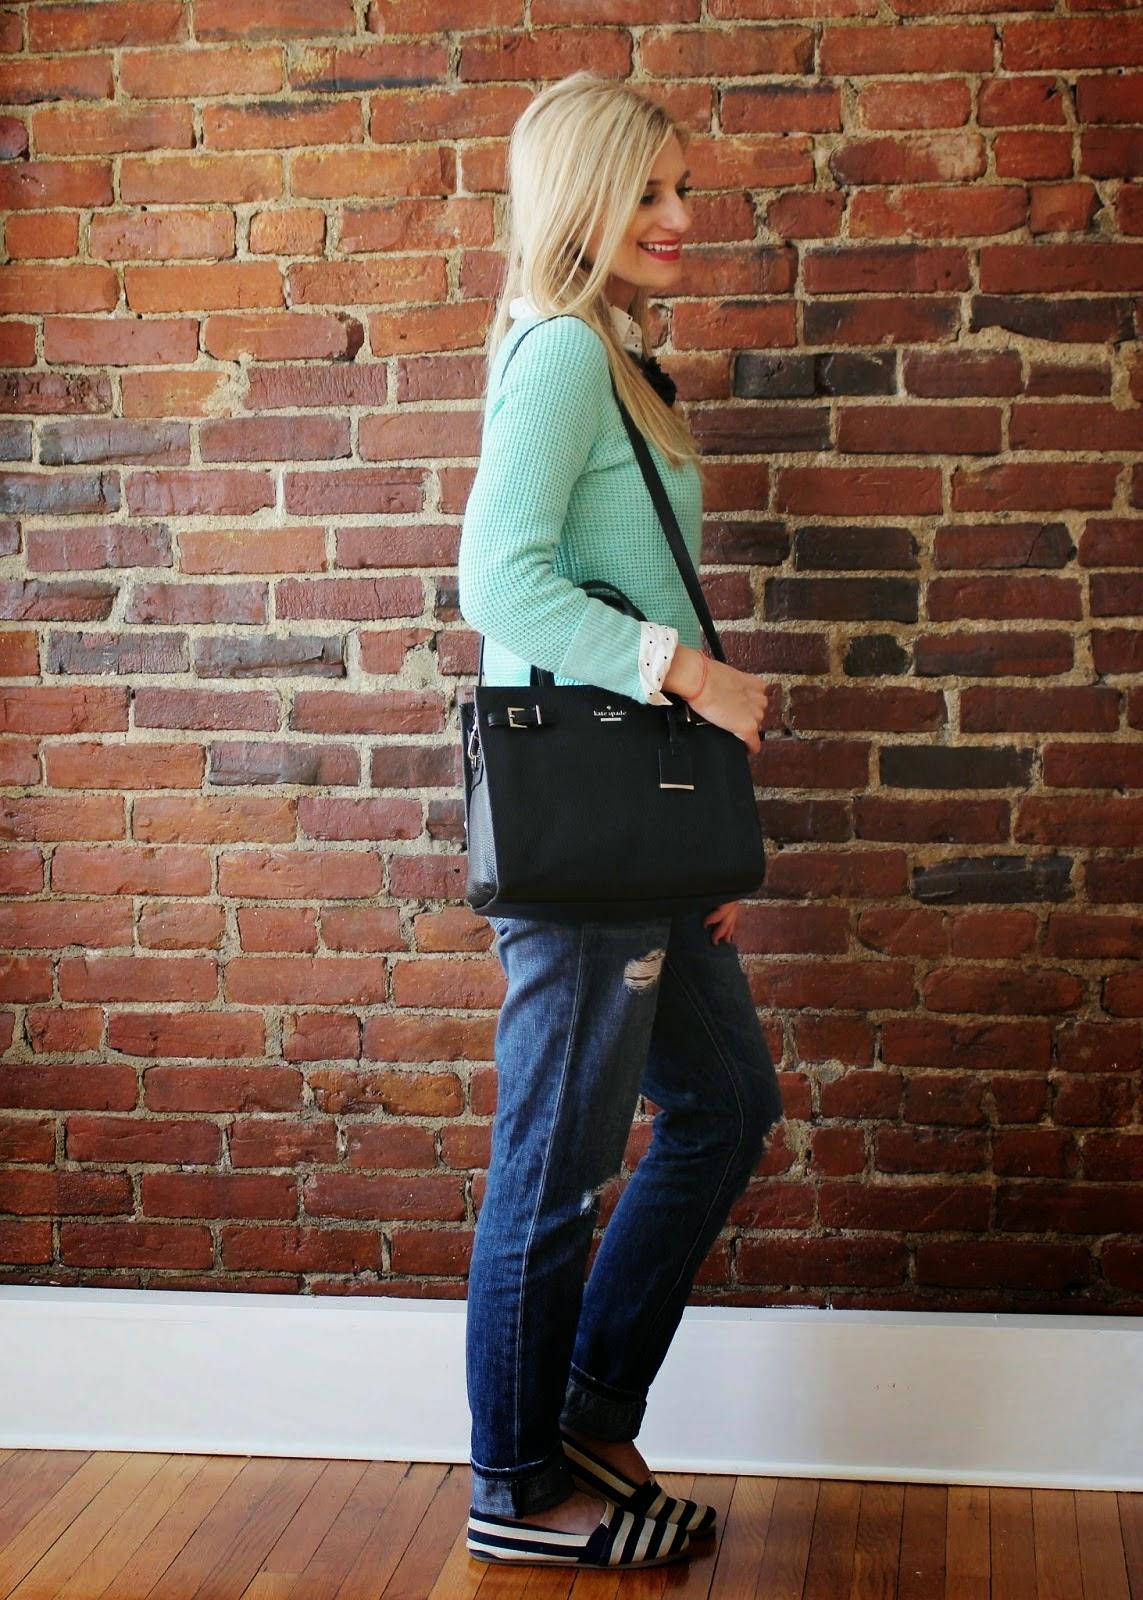 bijulnei - Jcrew mint sweater and Kate Spade handbag